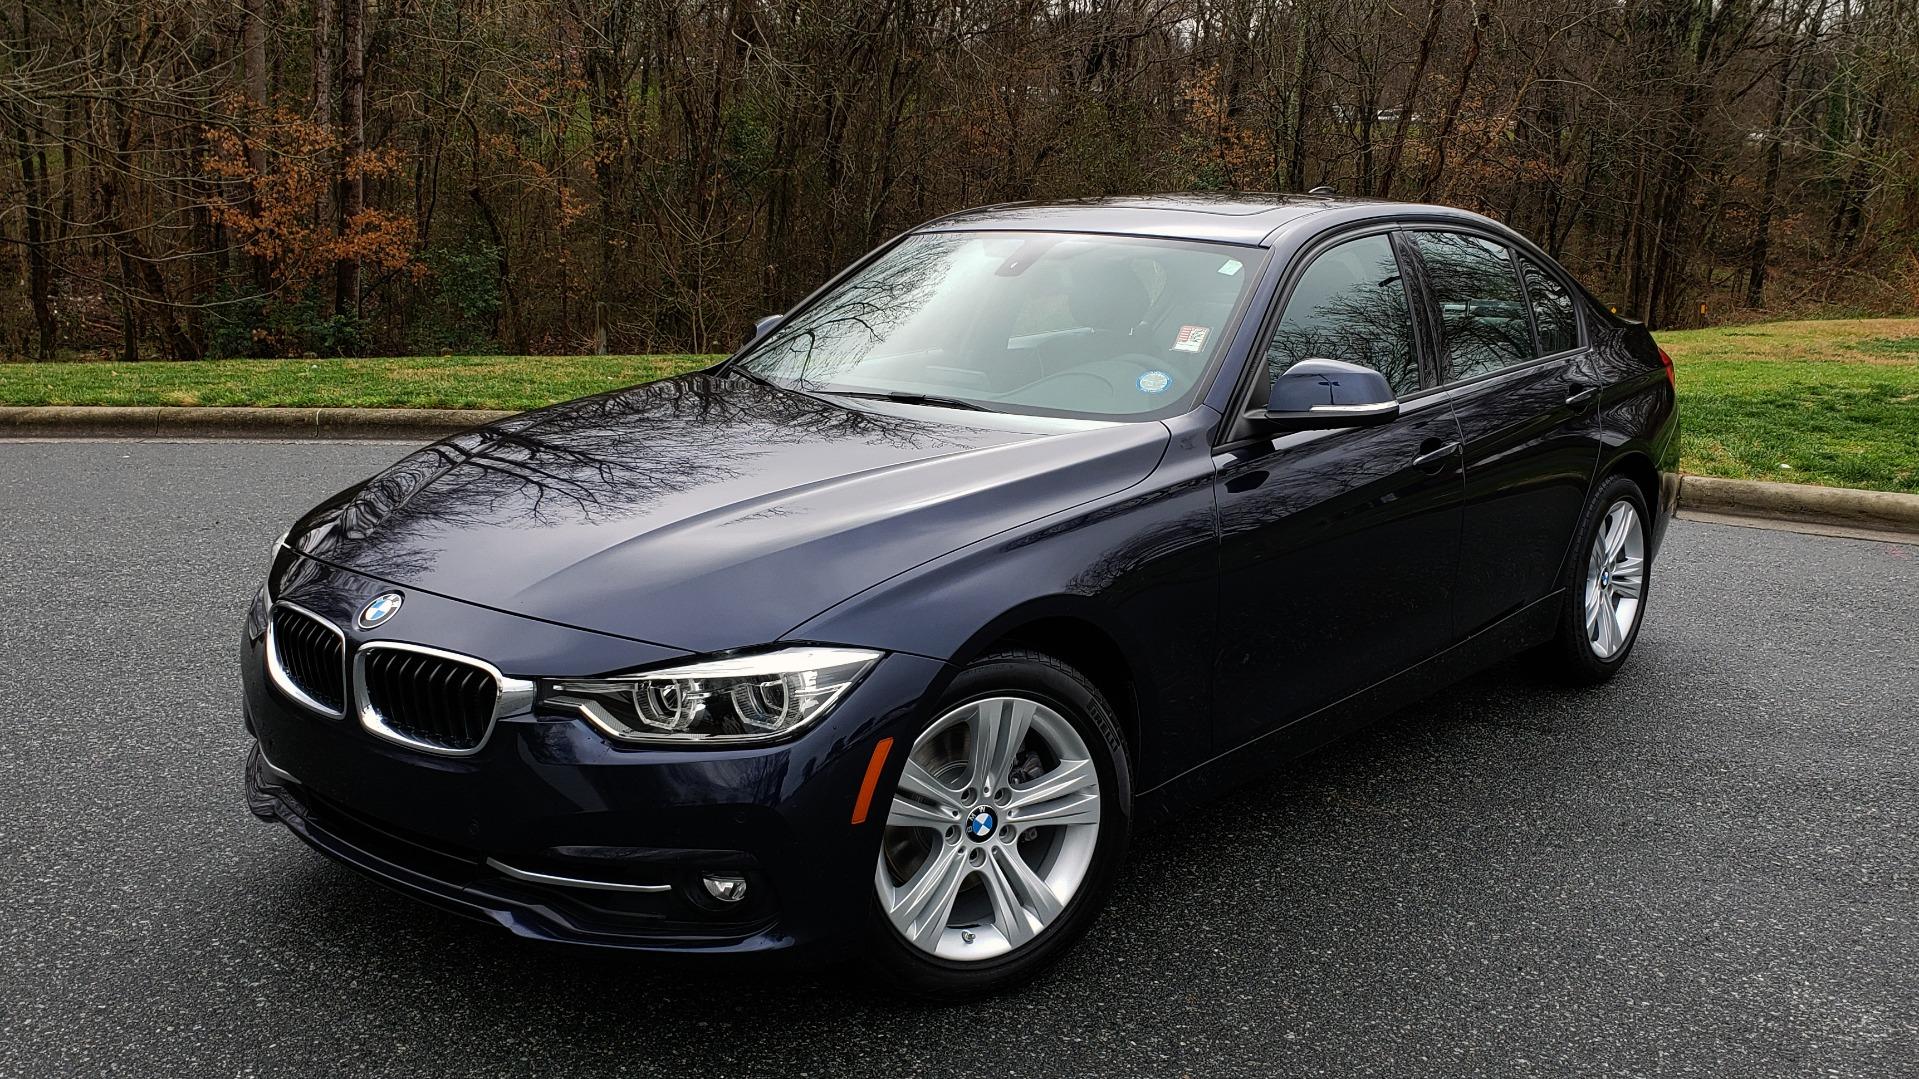 Used 2016 BMW 3 SERIES 328I PREMIUM PKG / DRVR ASST / SUNROOF / PARK ASST for sale Sold at Formula Imports in Charlotte NC 28227 1